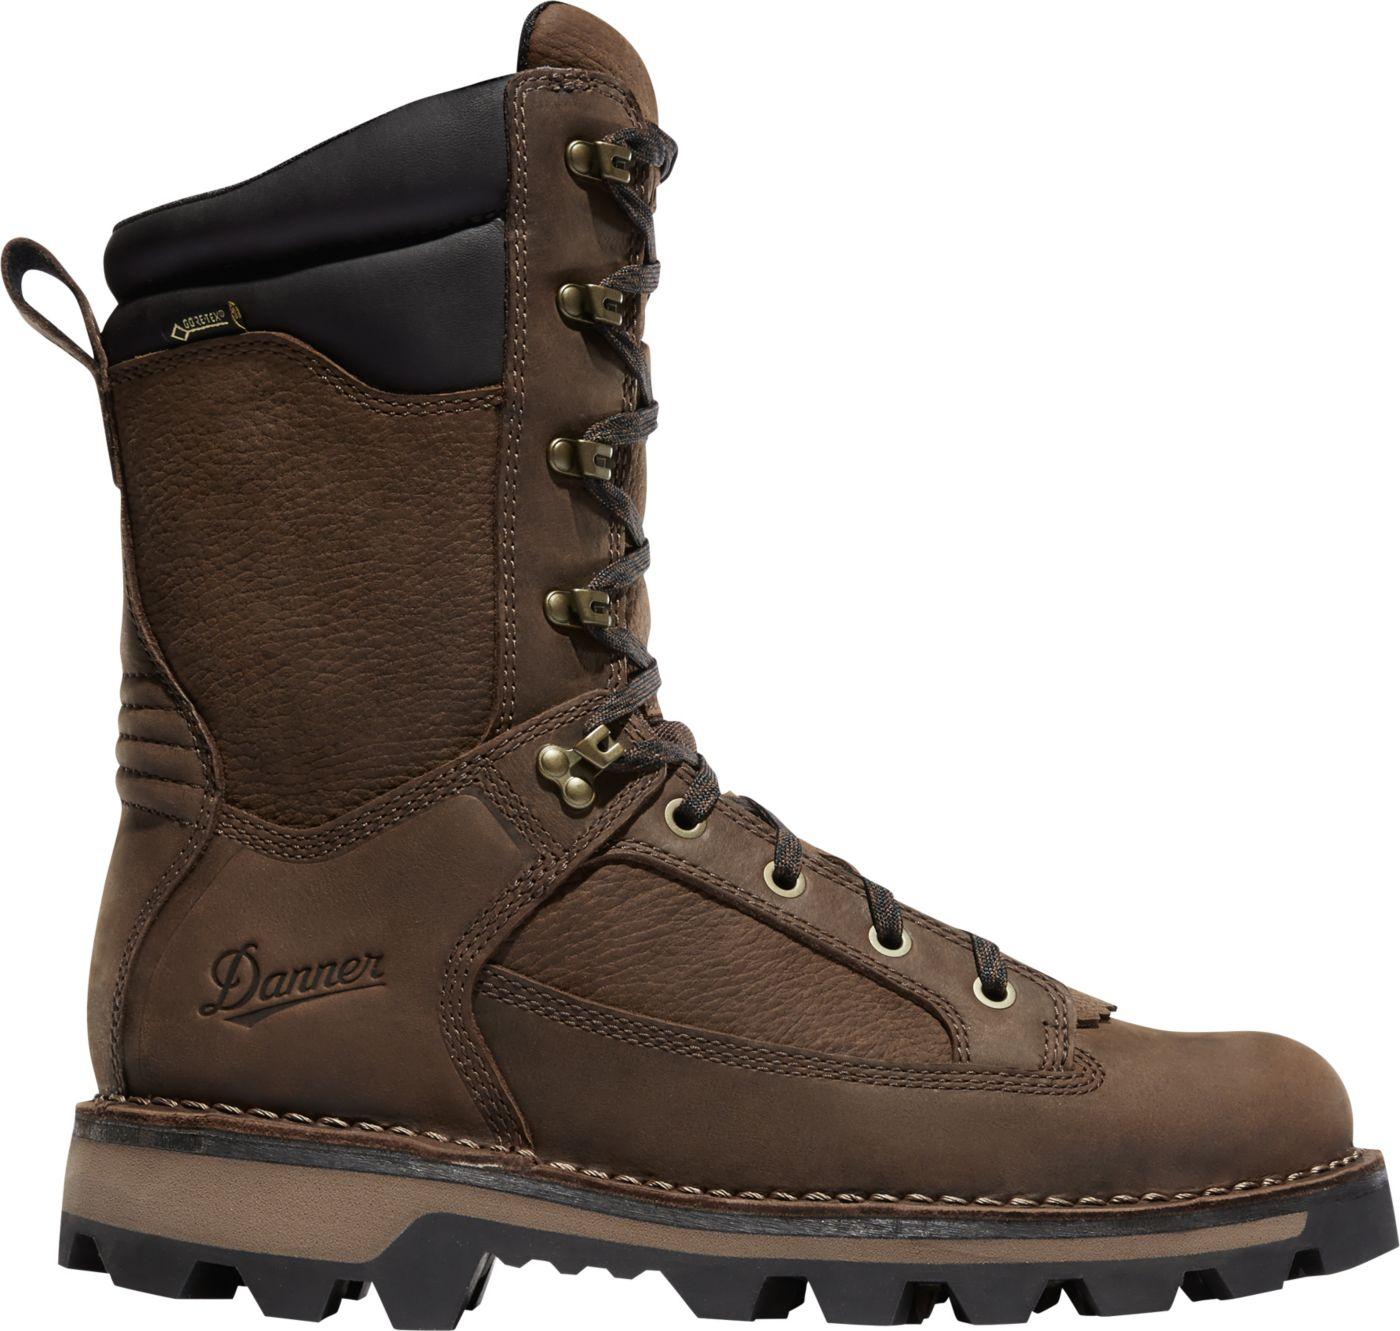 Danner Men's Powderhorn 1000g GORE-TEX Hunting Boots